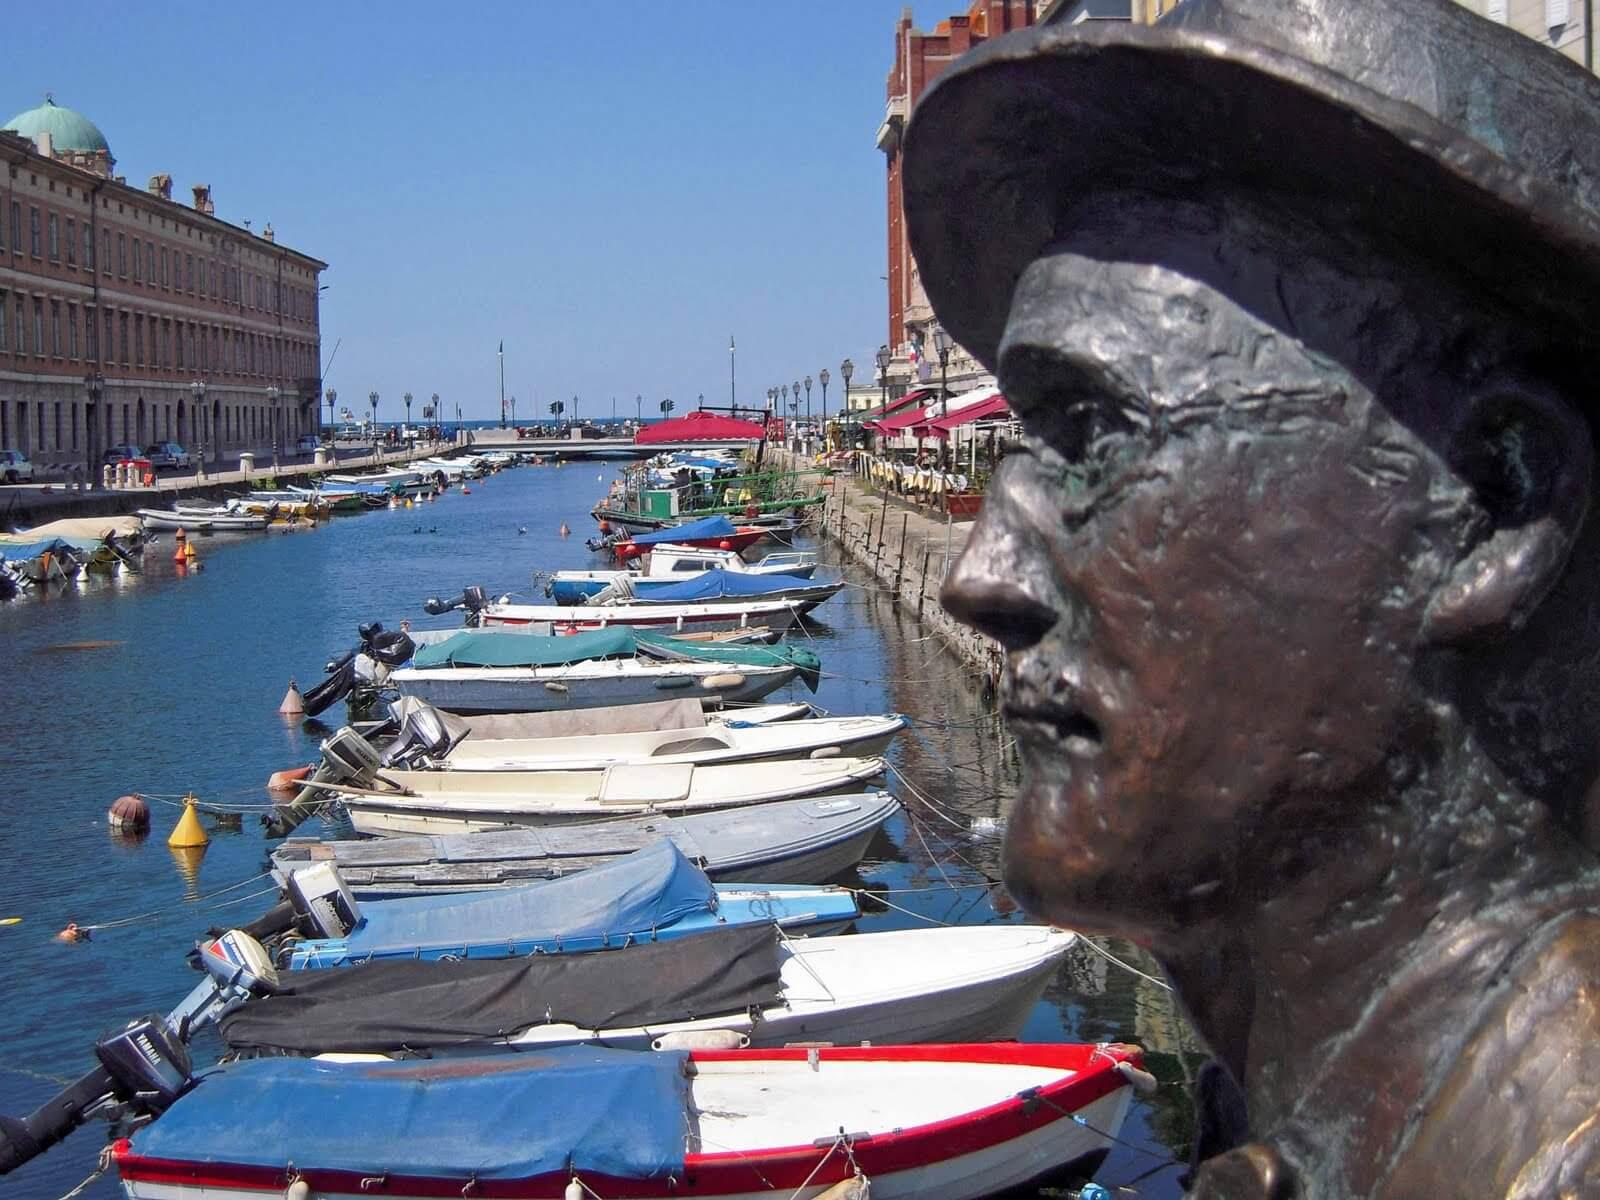 Cheap flights to Trieste